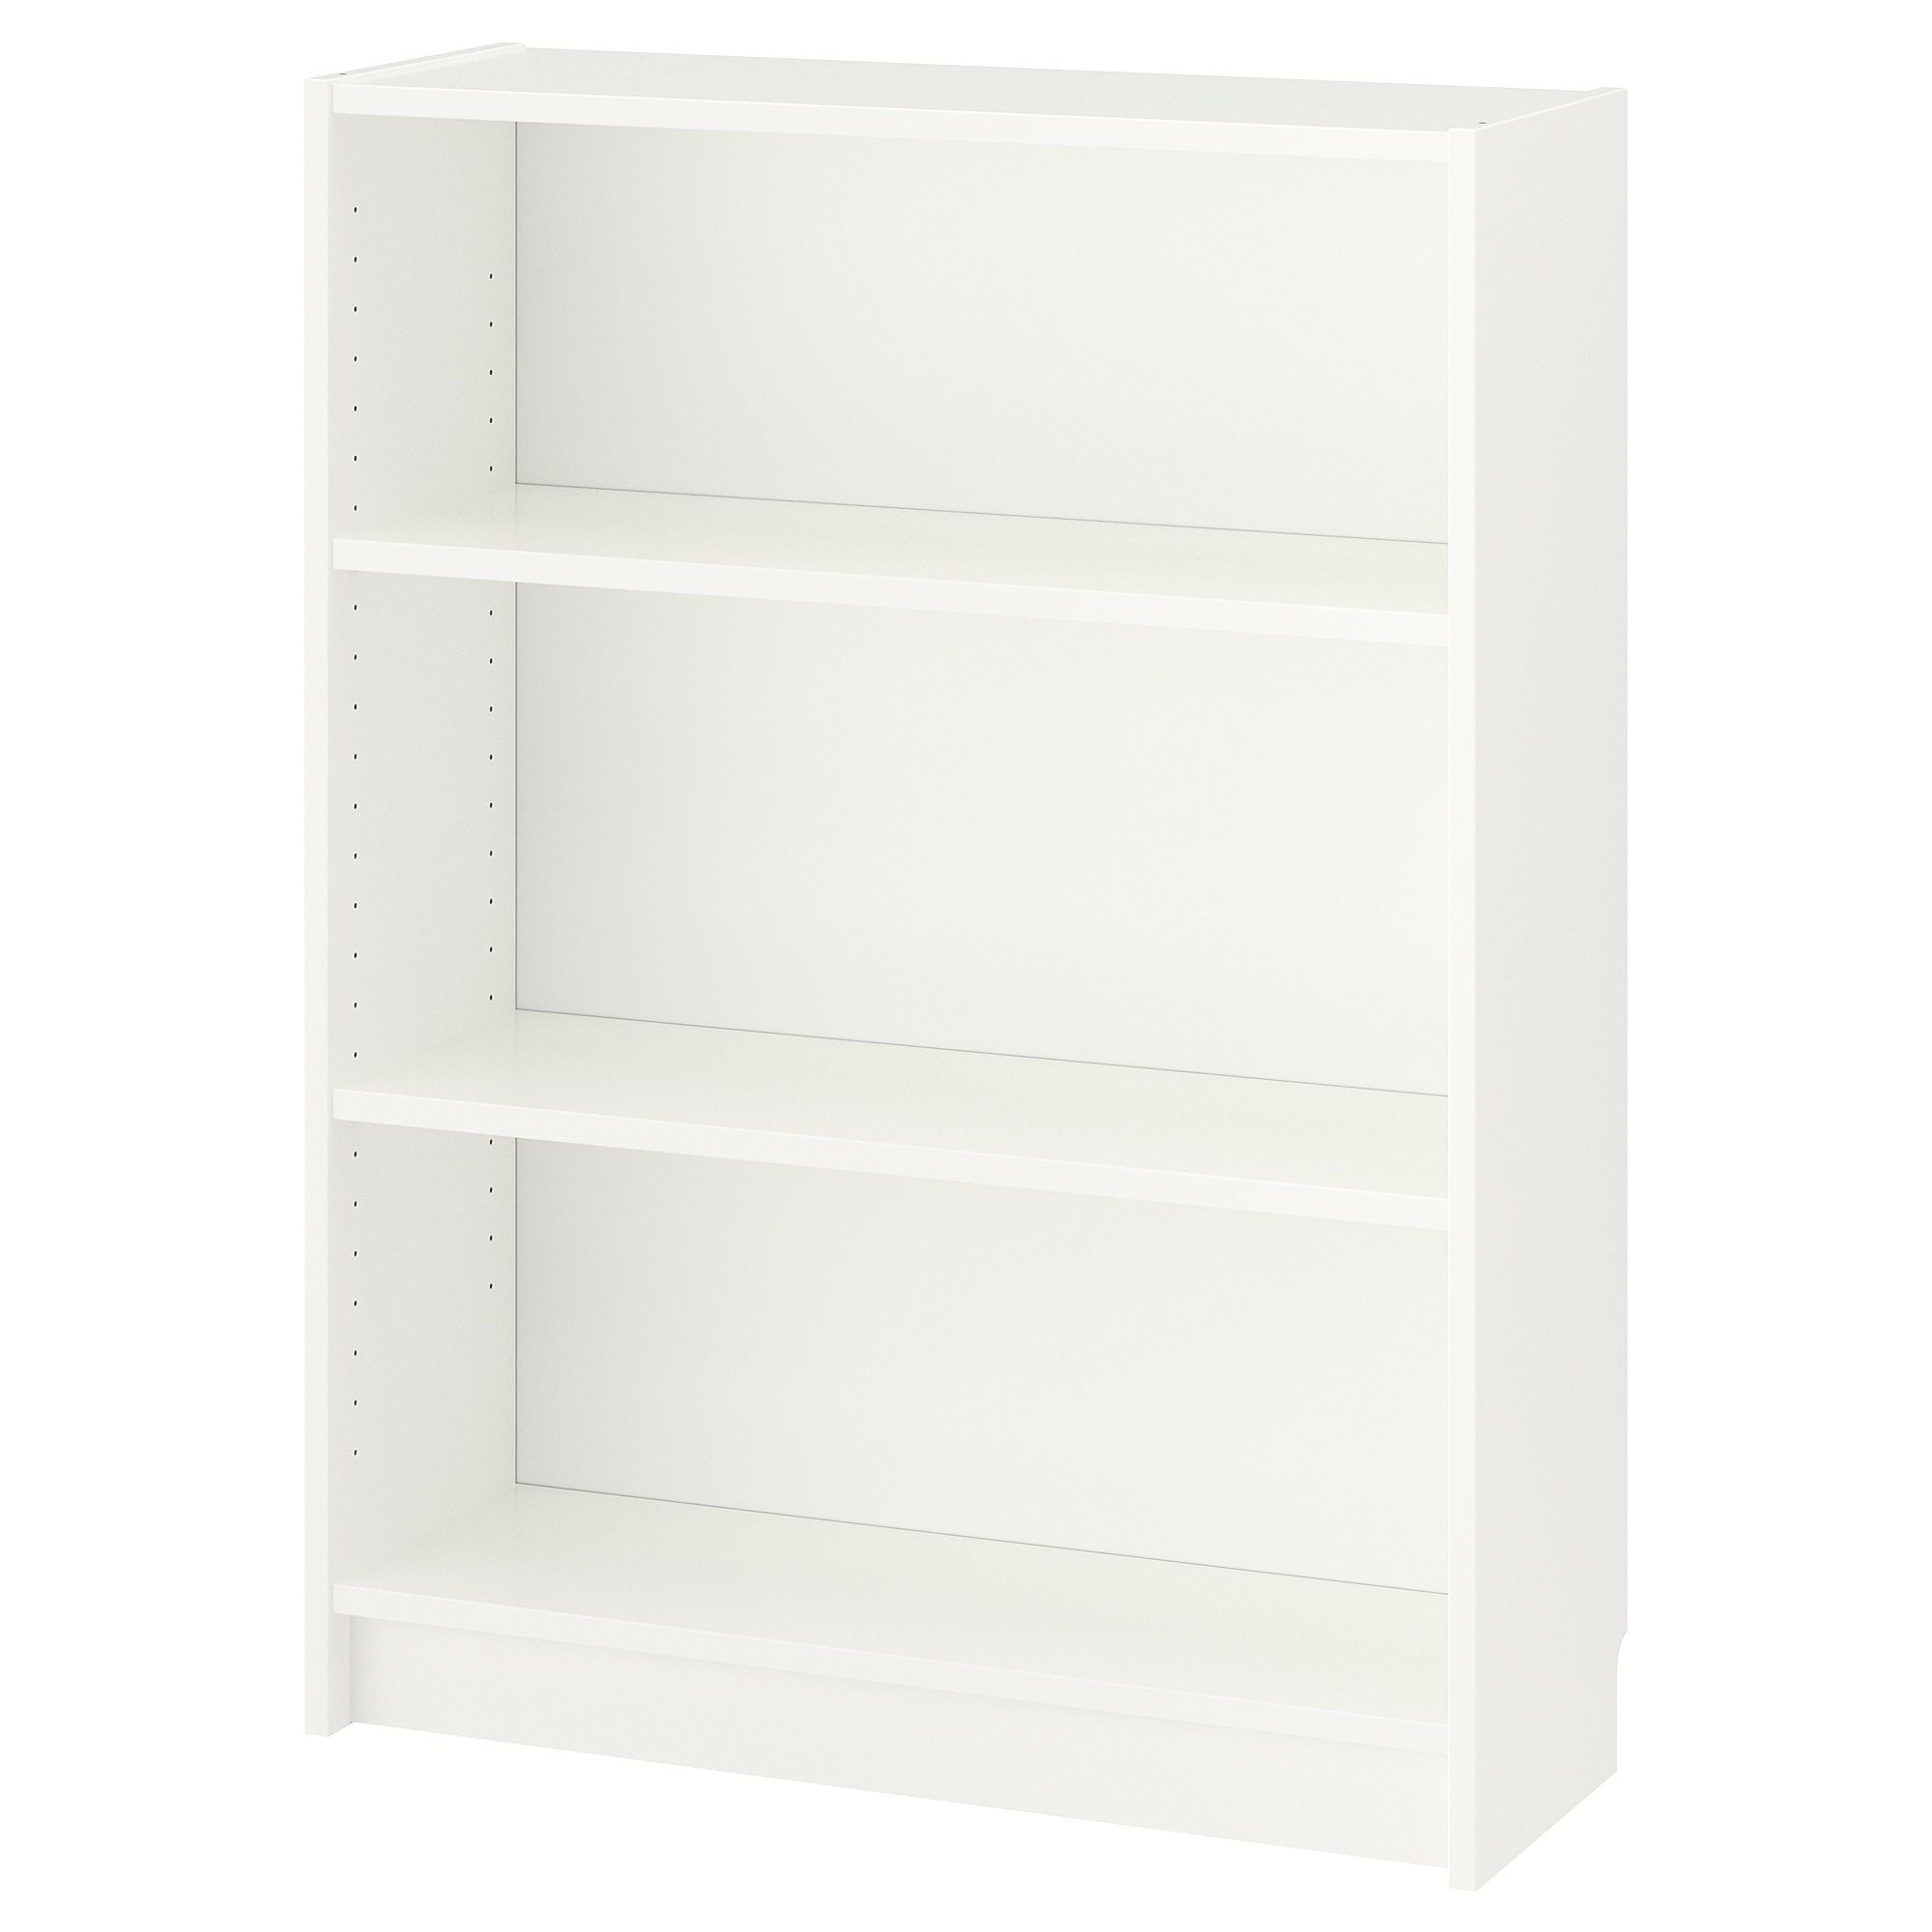 Ikea Billy White Bookcase In 2020 Ikea Bookcase Bookcase Ikea